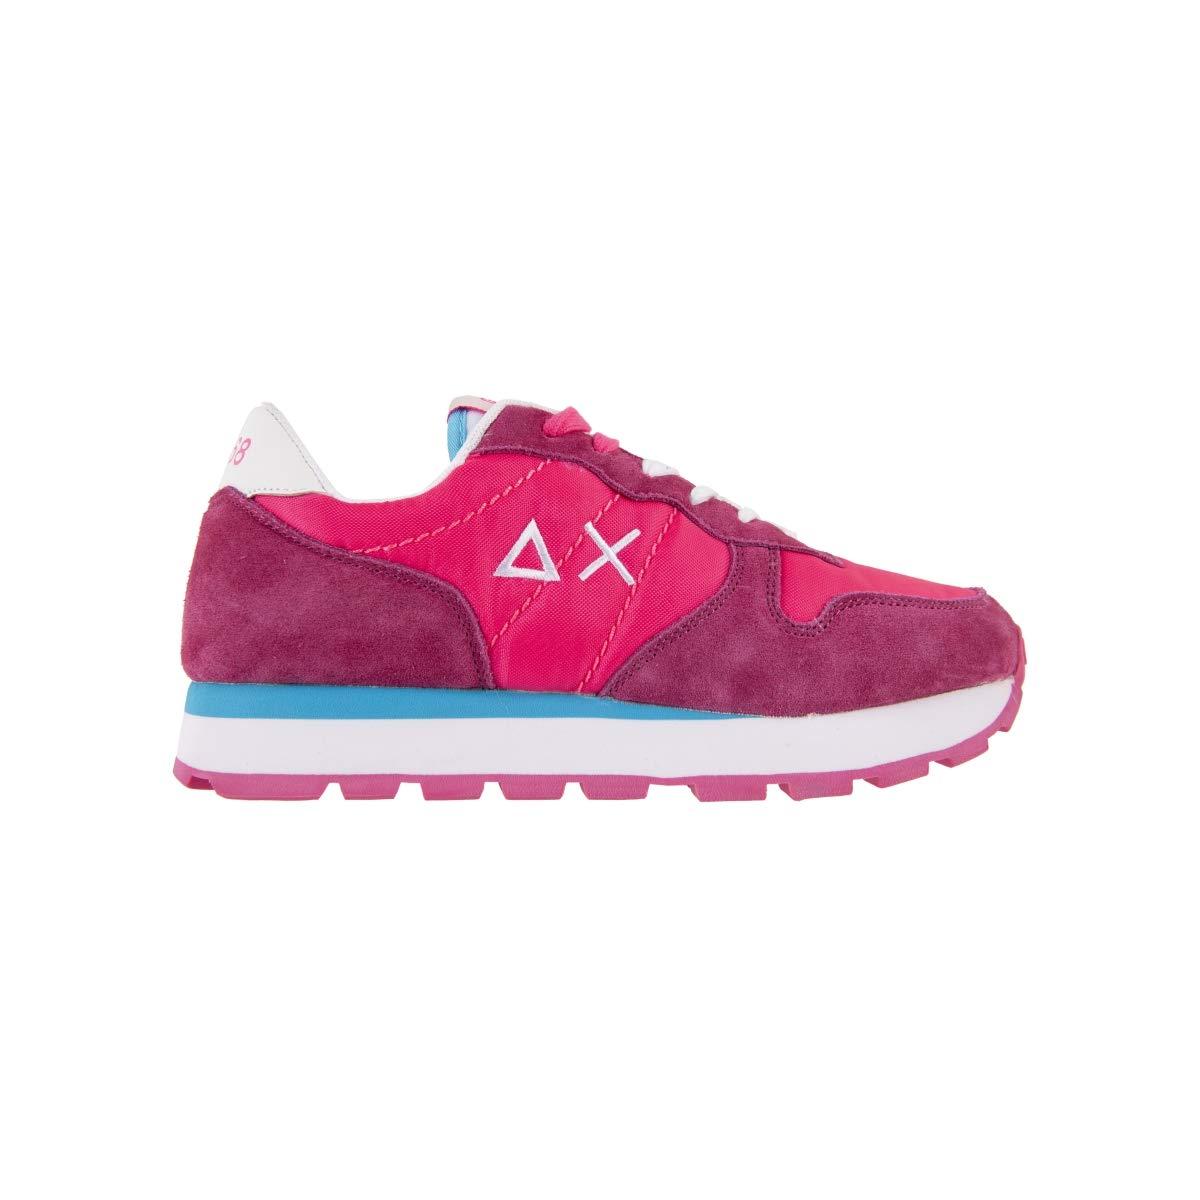 Sun 68 Scarpe da Donna scarpe da da da ginnastica Running Sportive Ginnastica in Tela Camoscio Fucsia Calzature Z19201 scarpe Nuove Comode Fondo Gomma dd4256